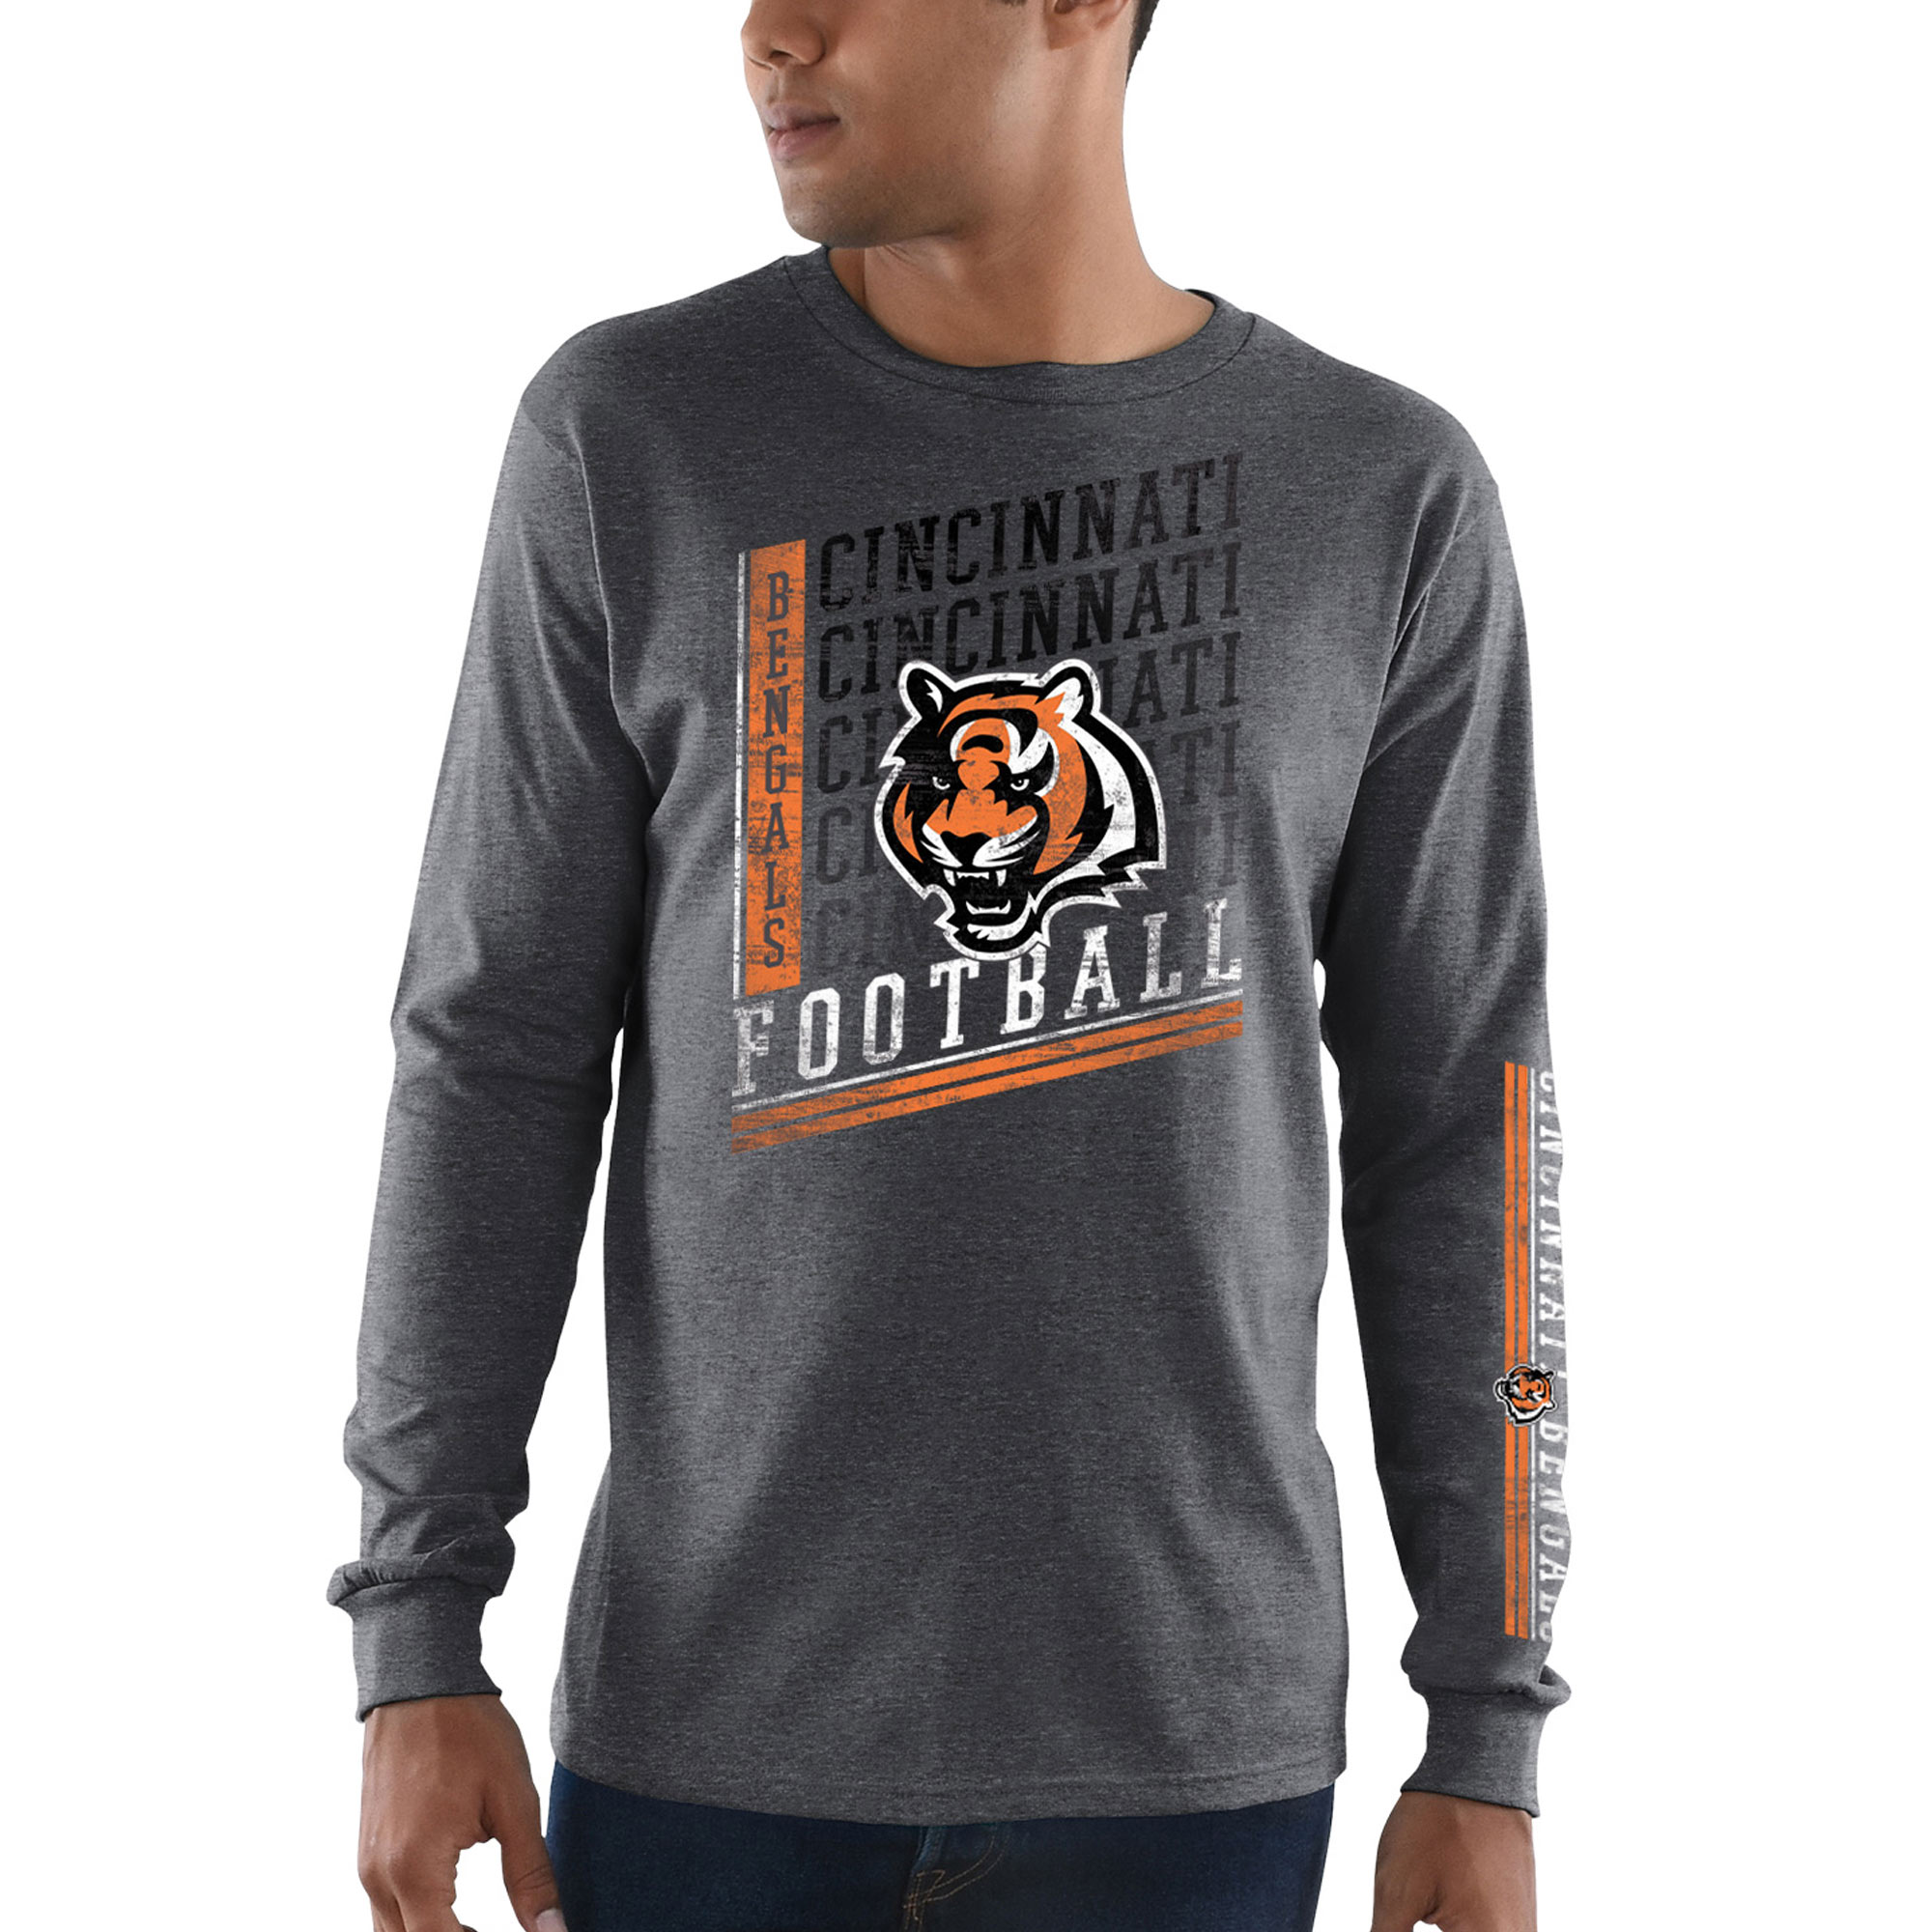 Cincinnati Bengals Majestic Dual Threat Long Sleeve T-Shirt - Heathered Charcoal